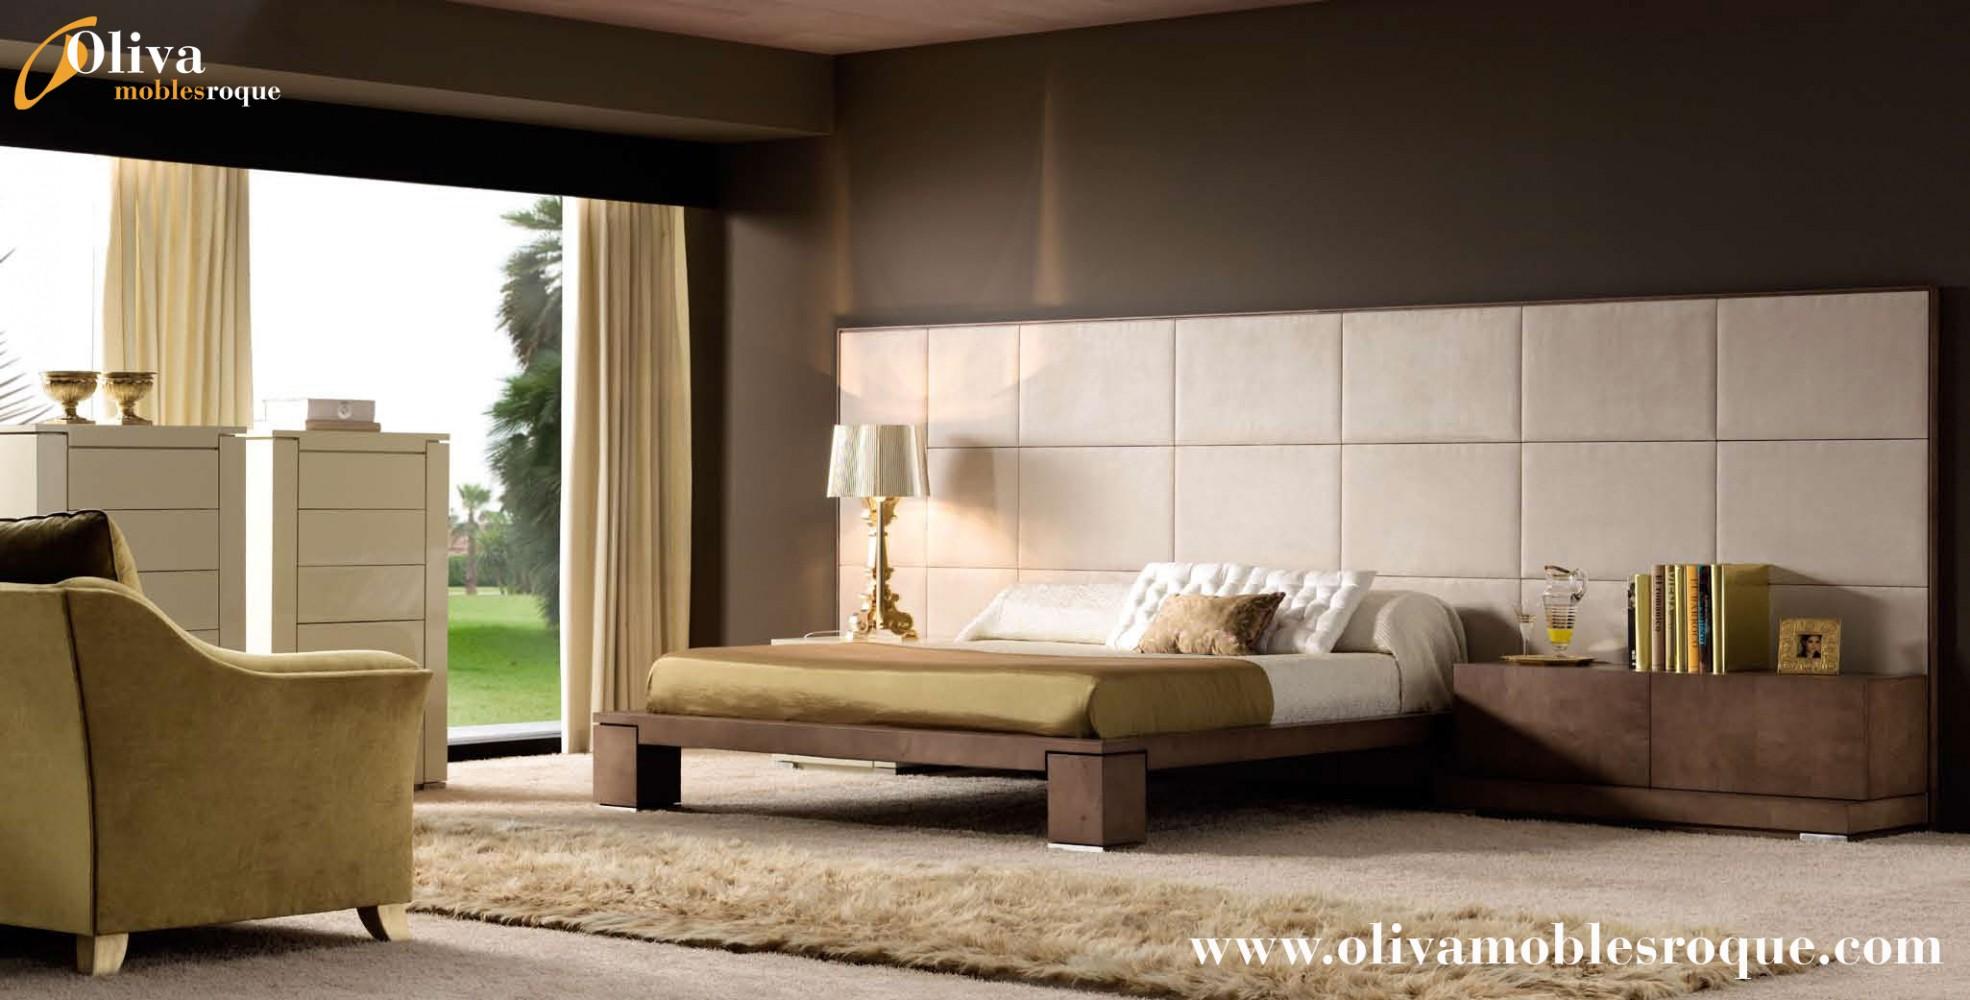 Im genes dormitorios modernos piferrer treku moblec - Imagenes dormitorios modernos ...